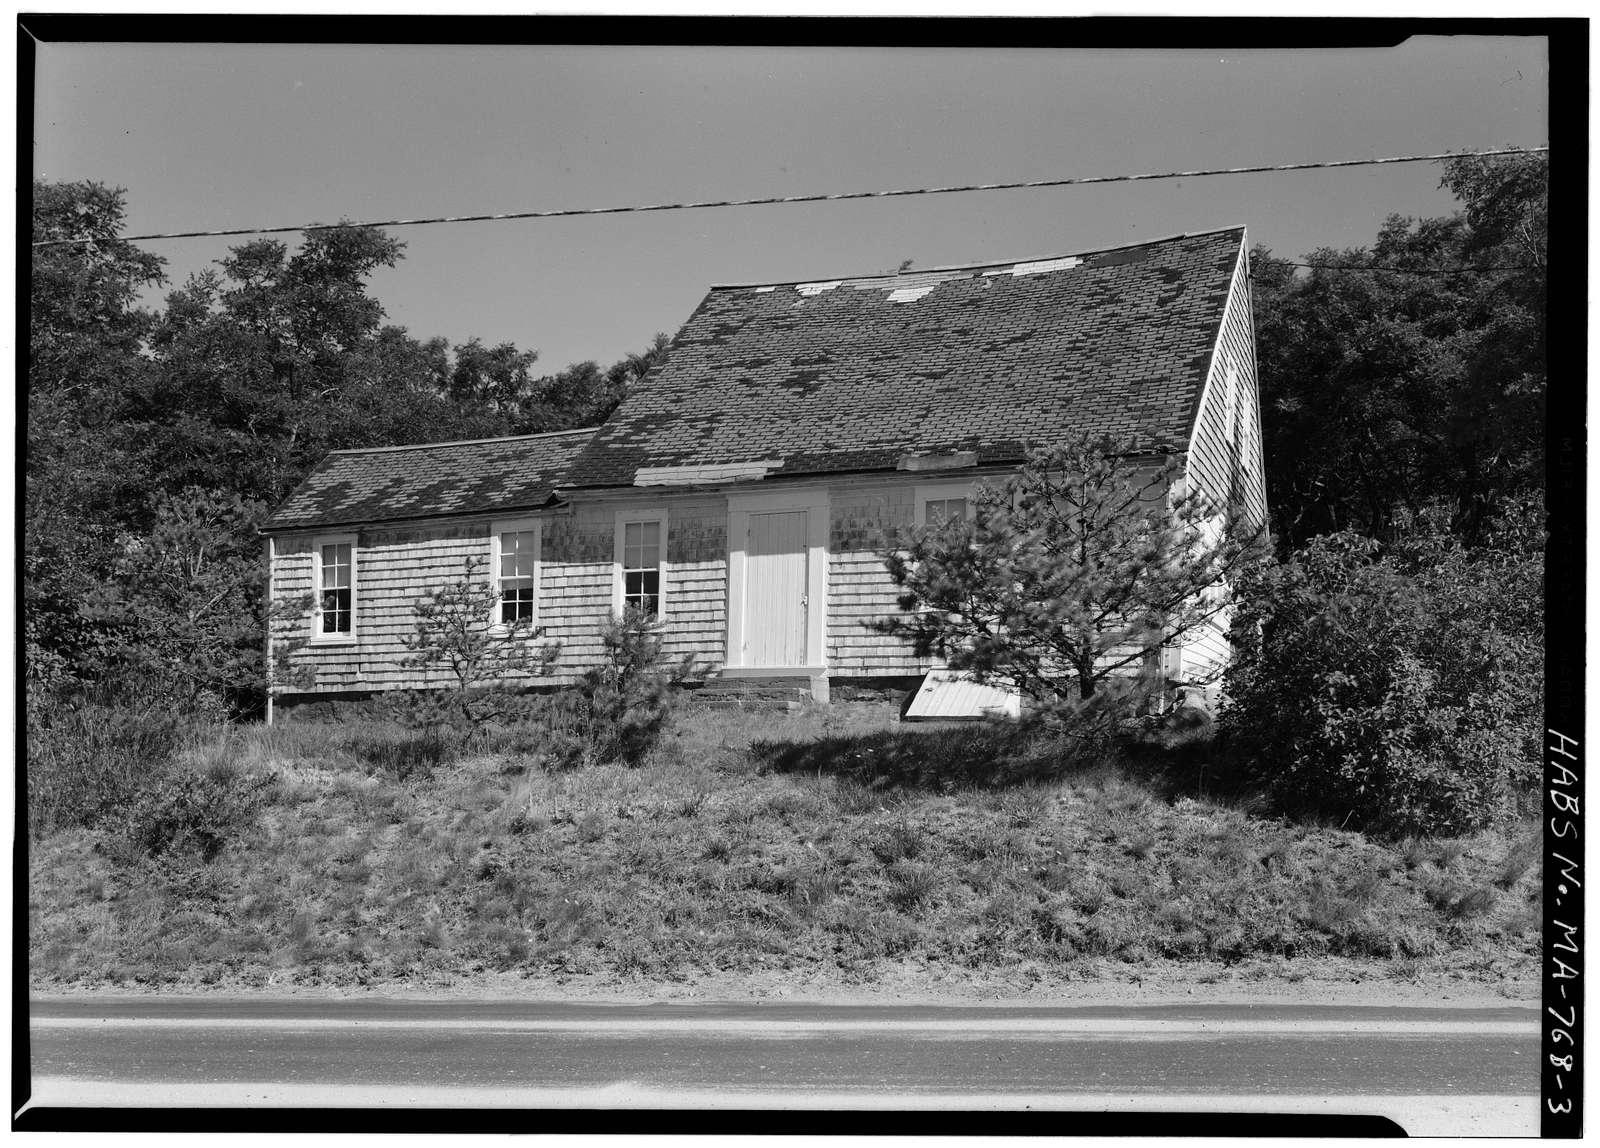 Ambrose Snow House & Cobbler Shop, North Pamet Road, Truro, Barnstable County, MA